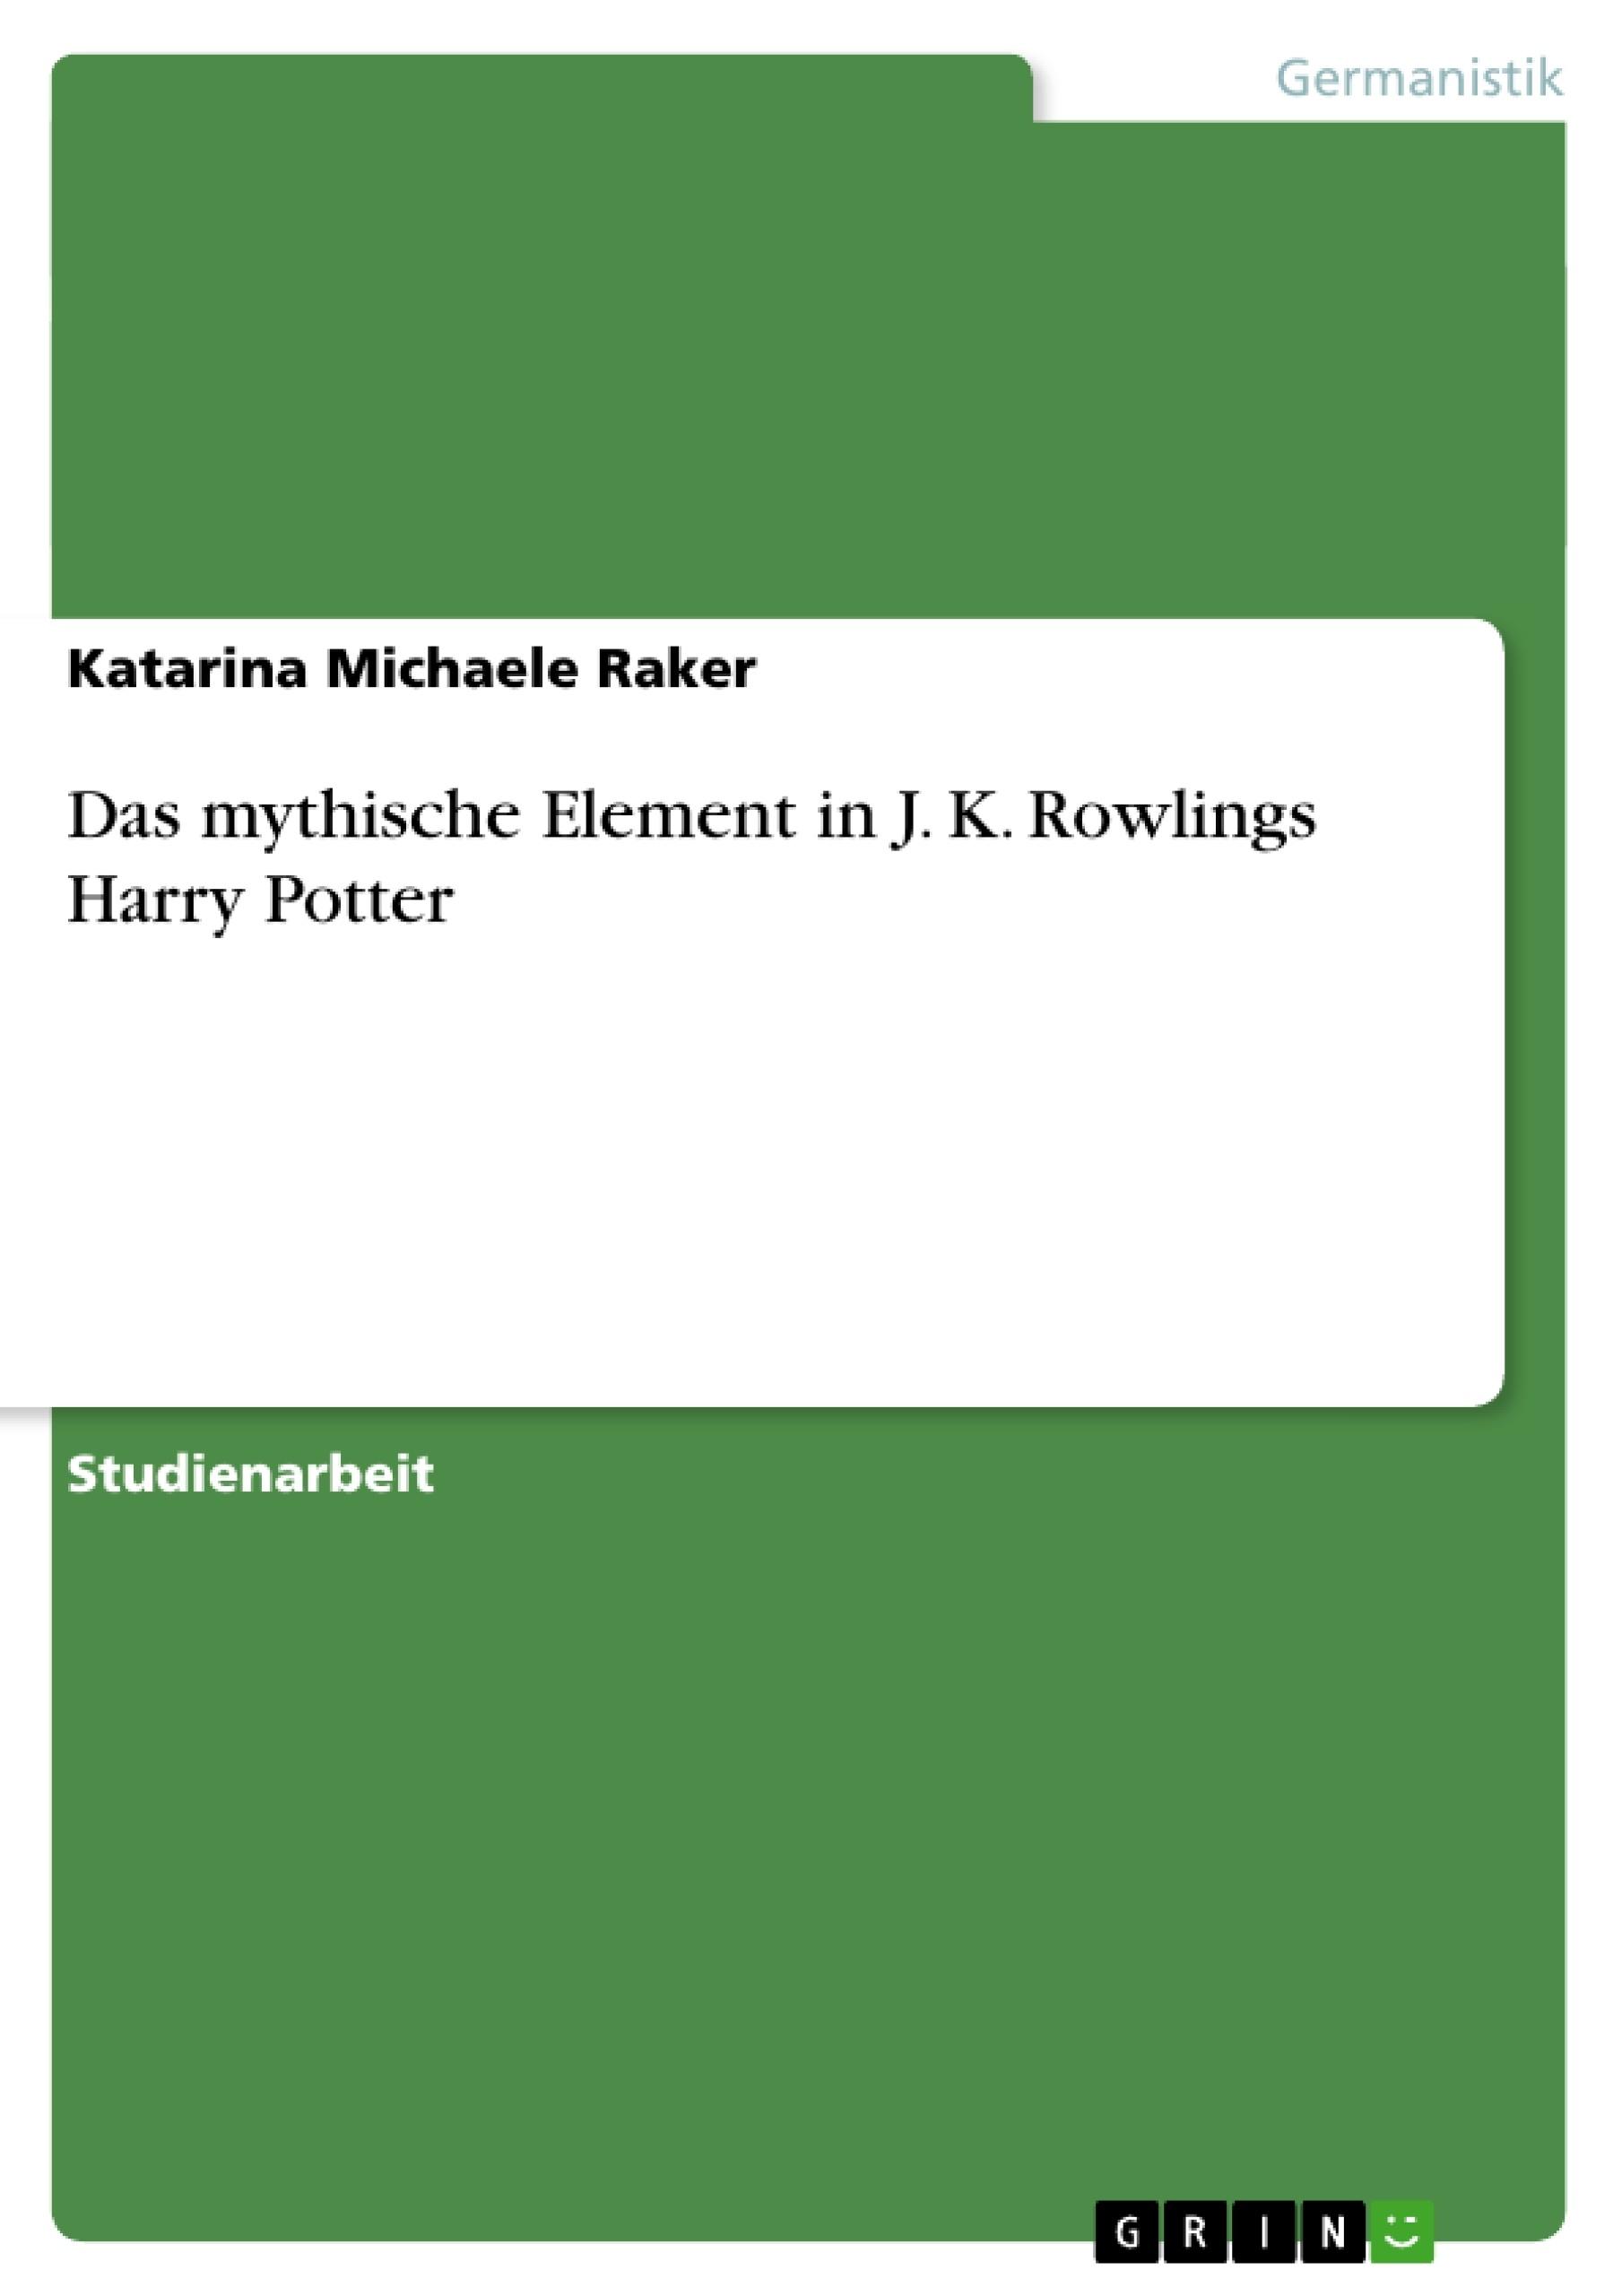 Titel: Das mythische Element in J. K. Rowlings Harry Potter